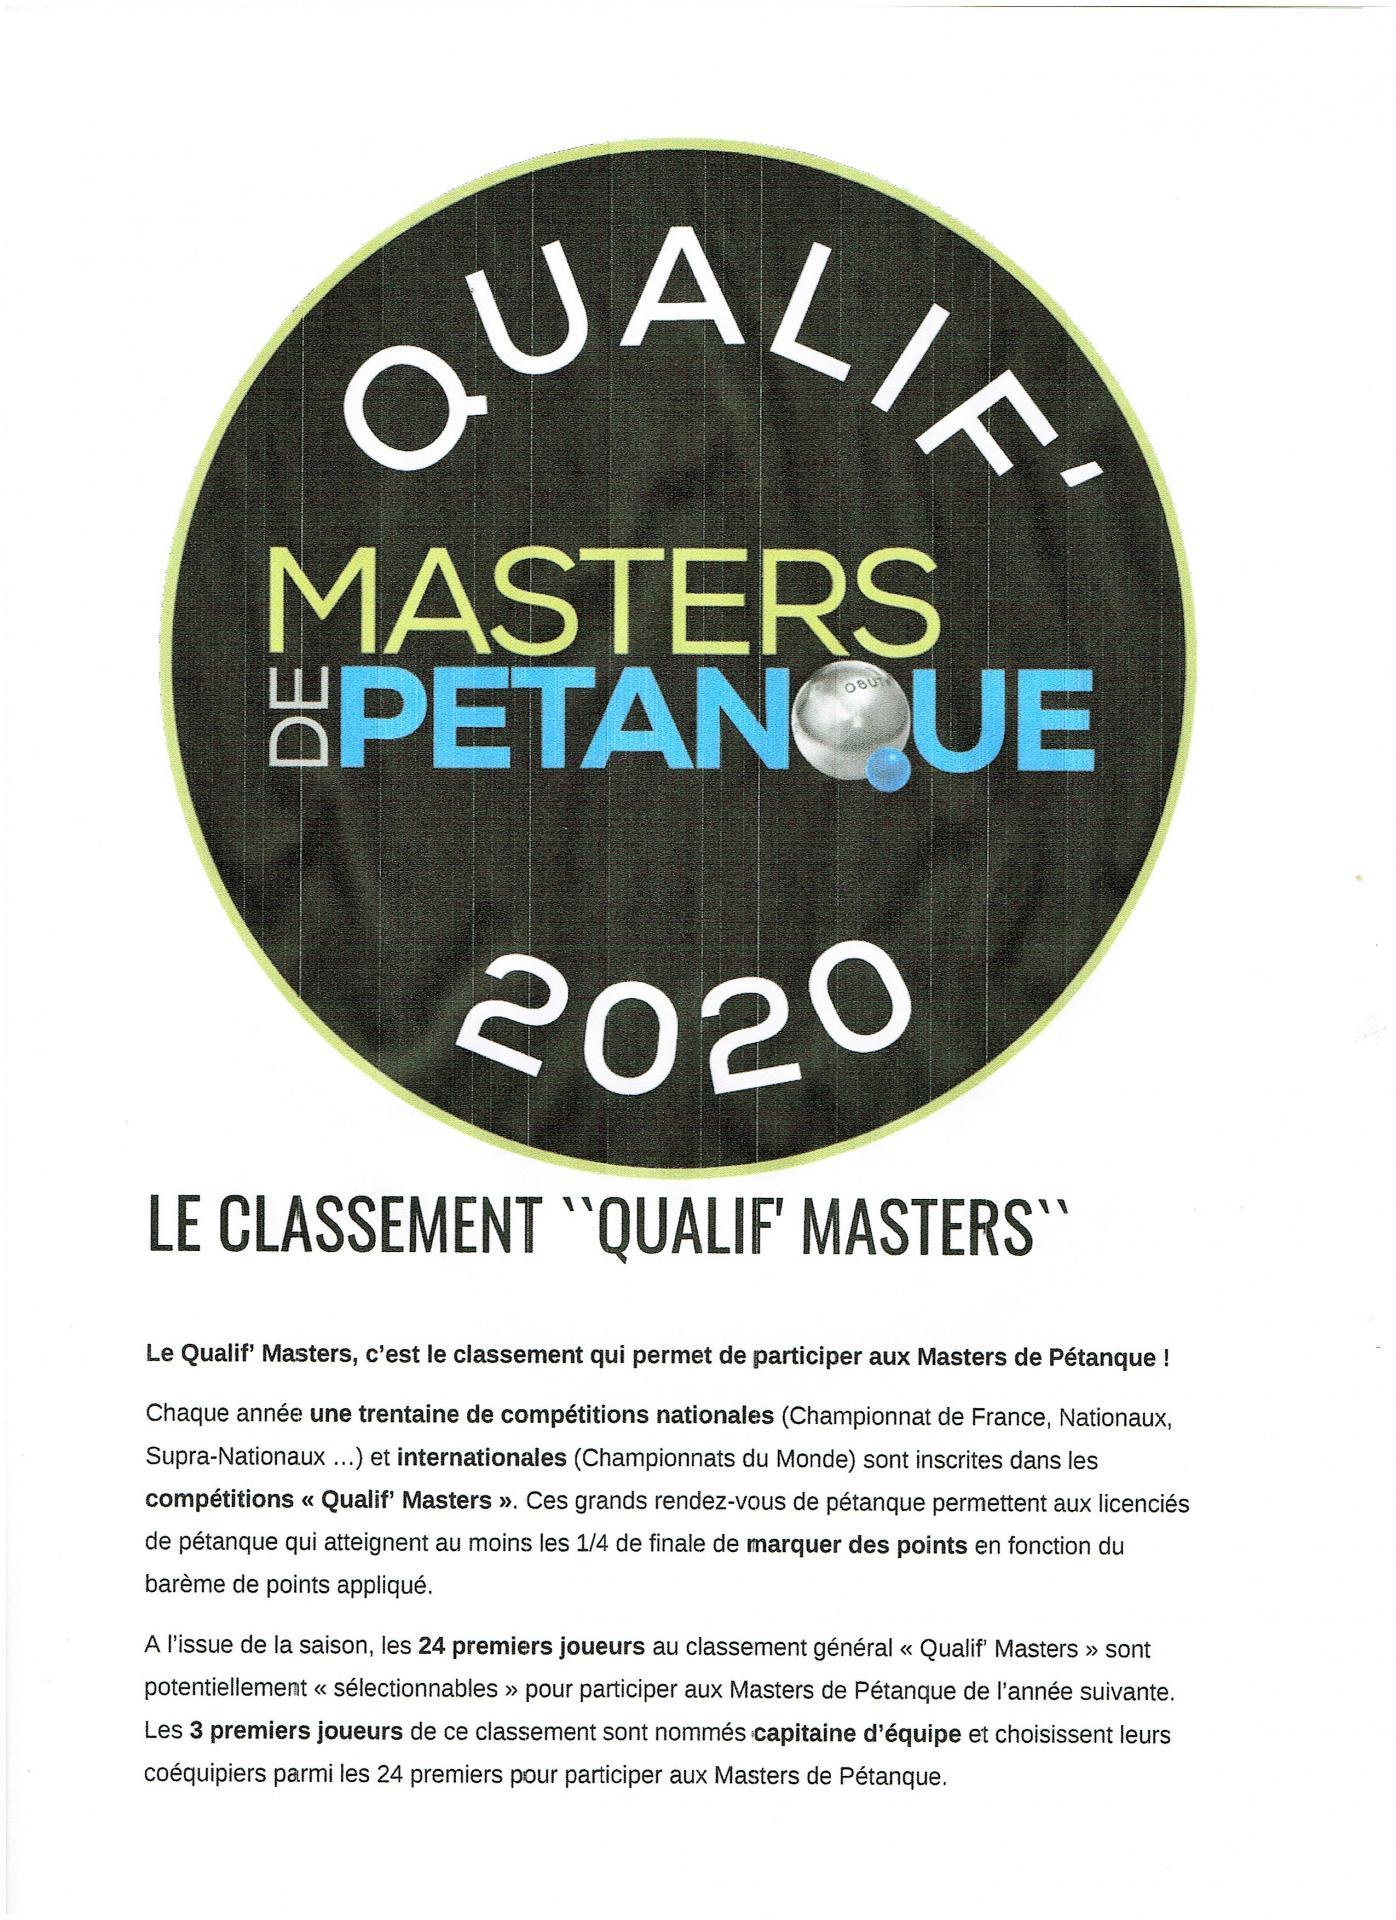 Qualif master 2020 e